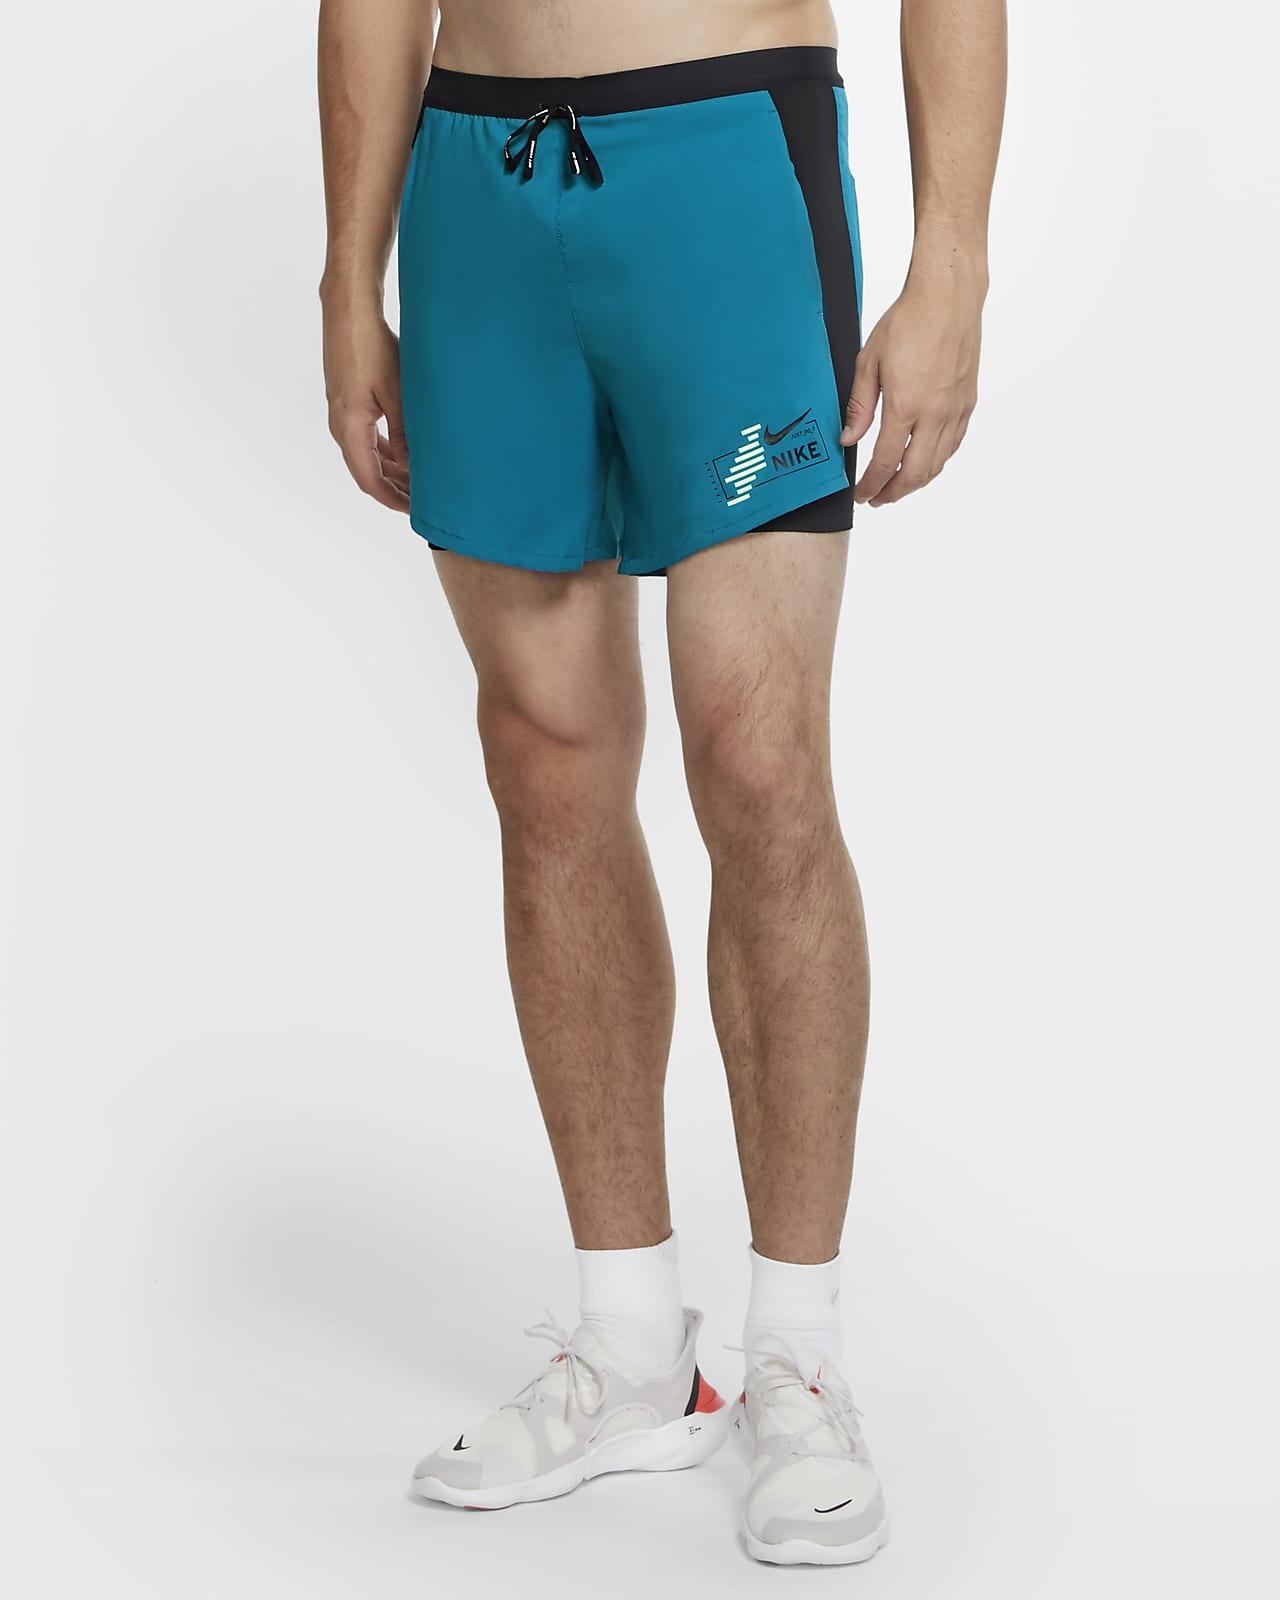 Nike Flex Stride Future Fast Men's 2-In-1 Running Shorts